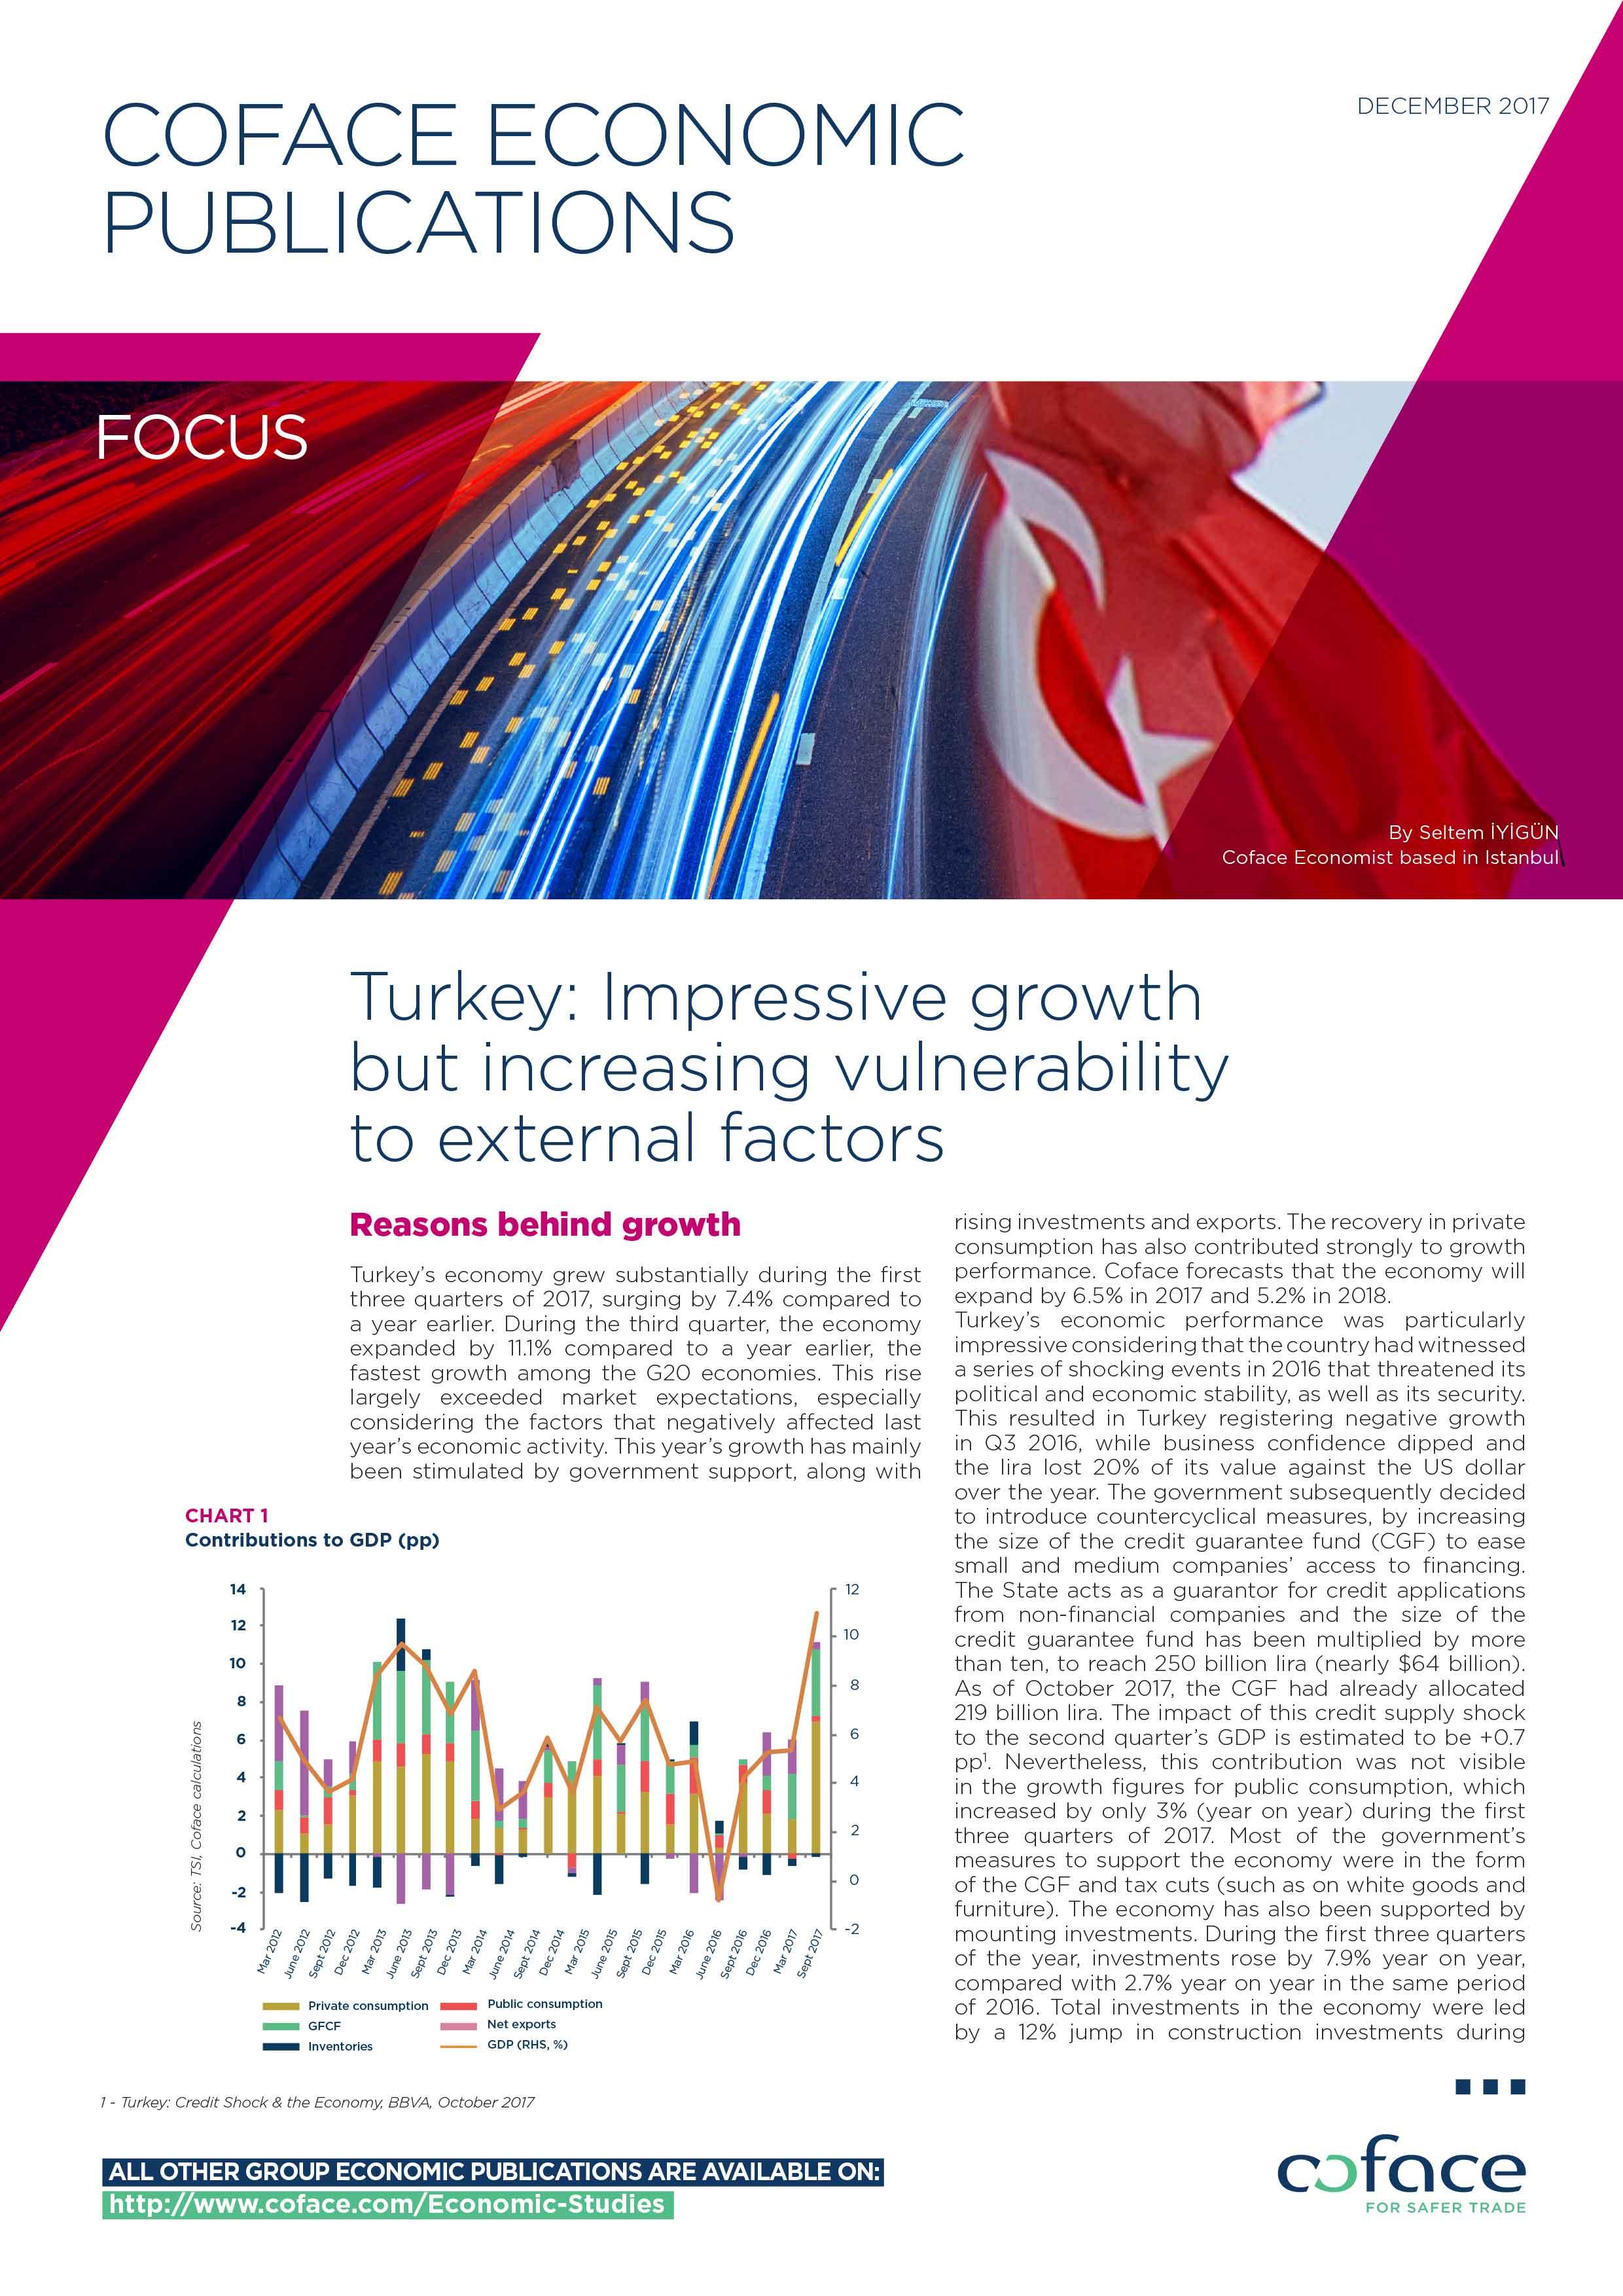 Turkey: Impressive growth but increasing vulnerability to external factors